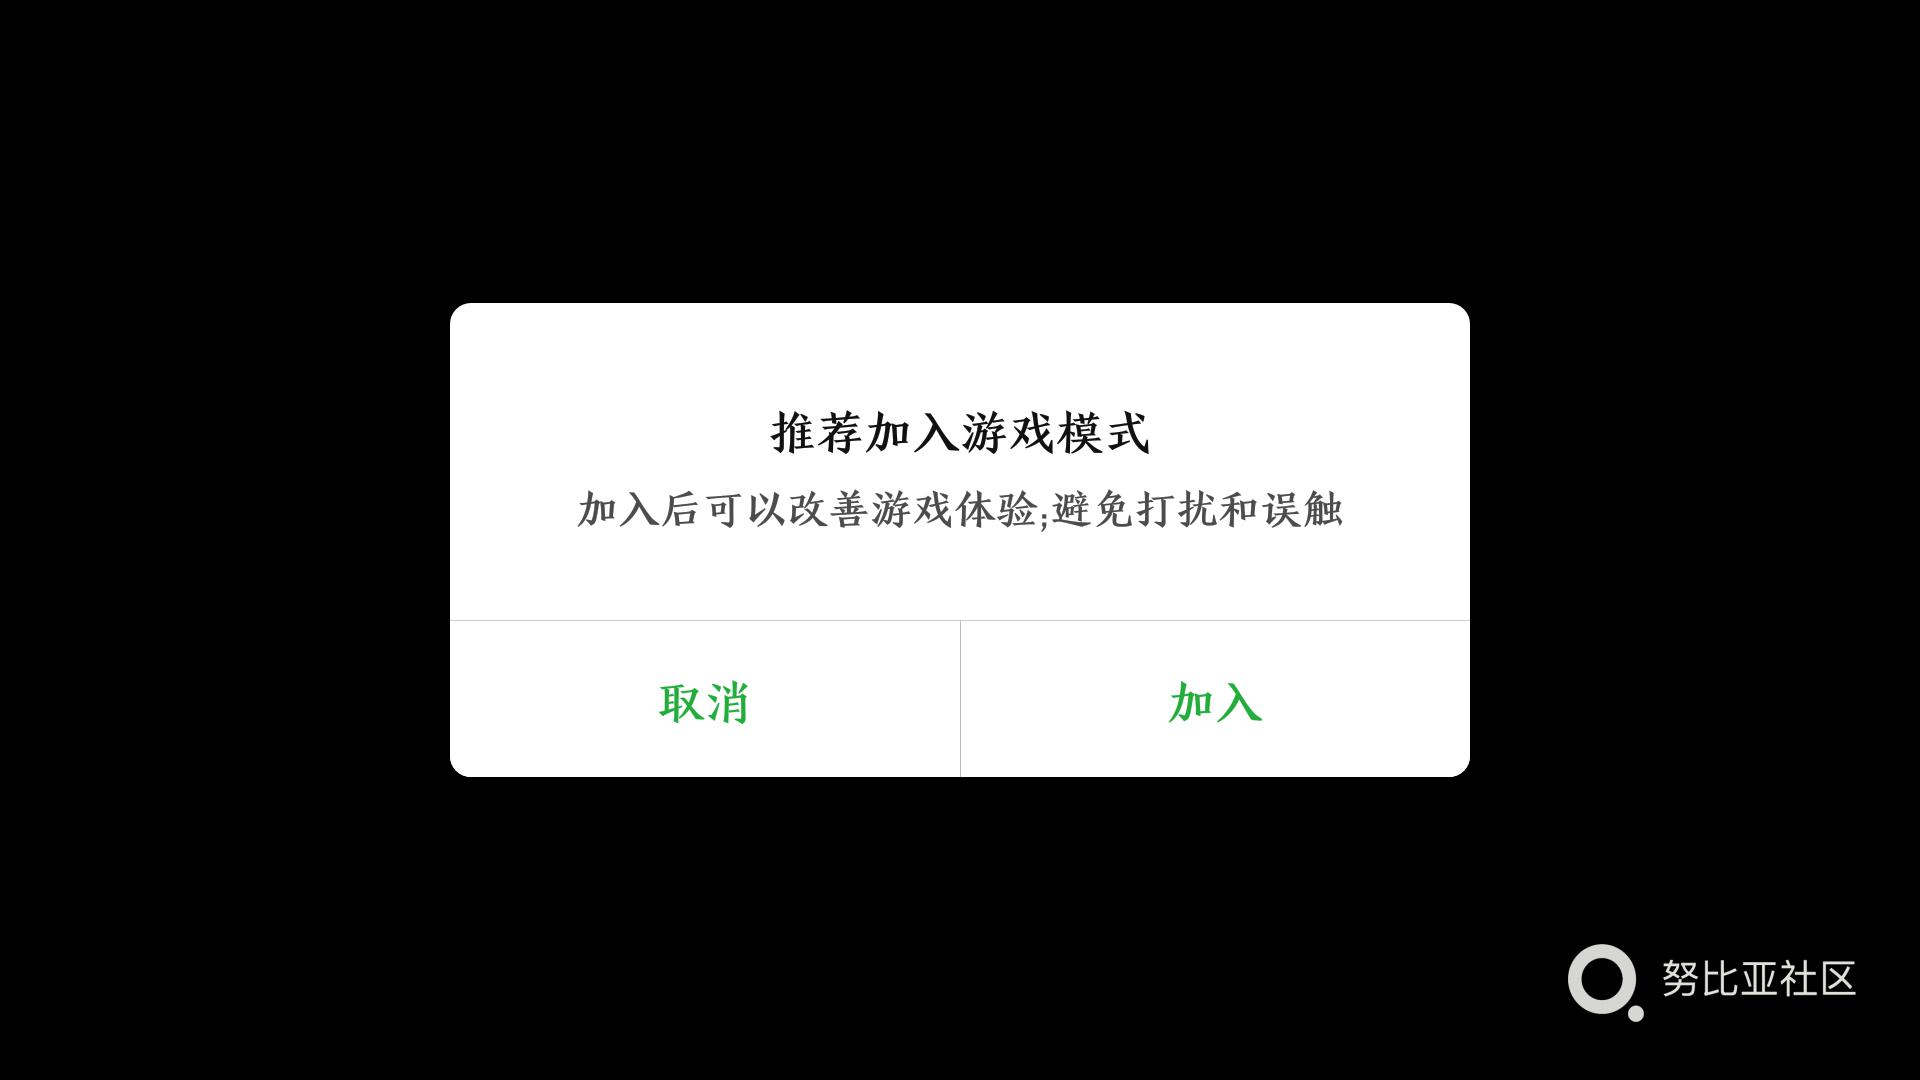 Screenshot_2018-03-16-20-37-53.png